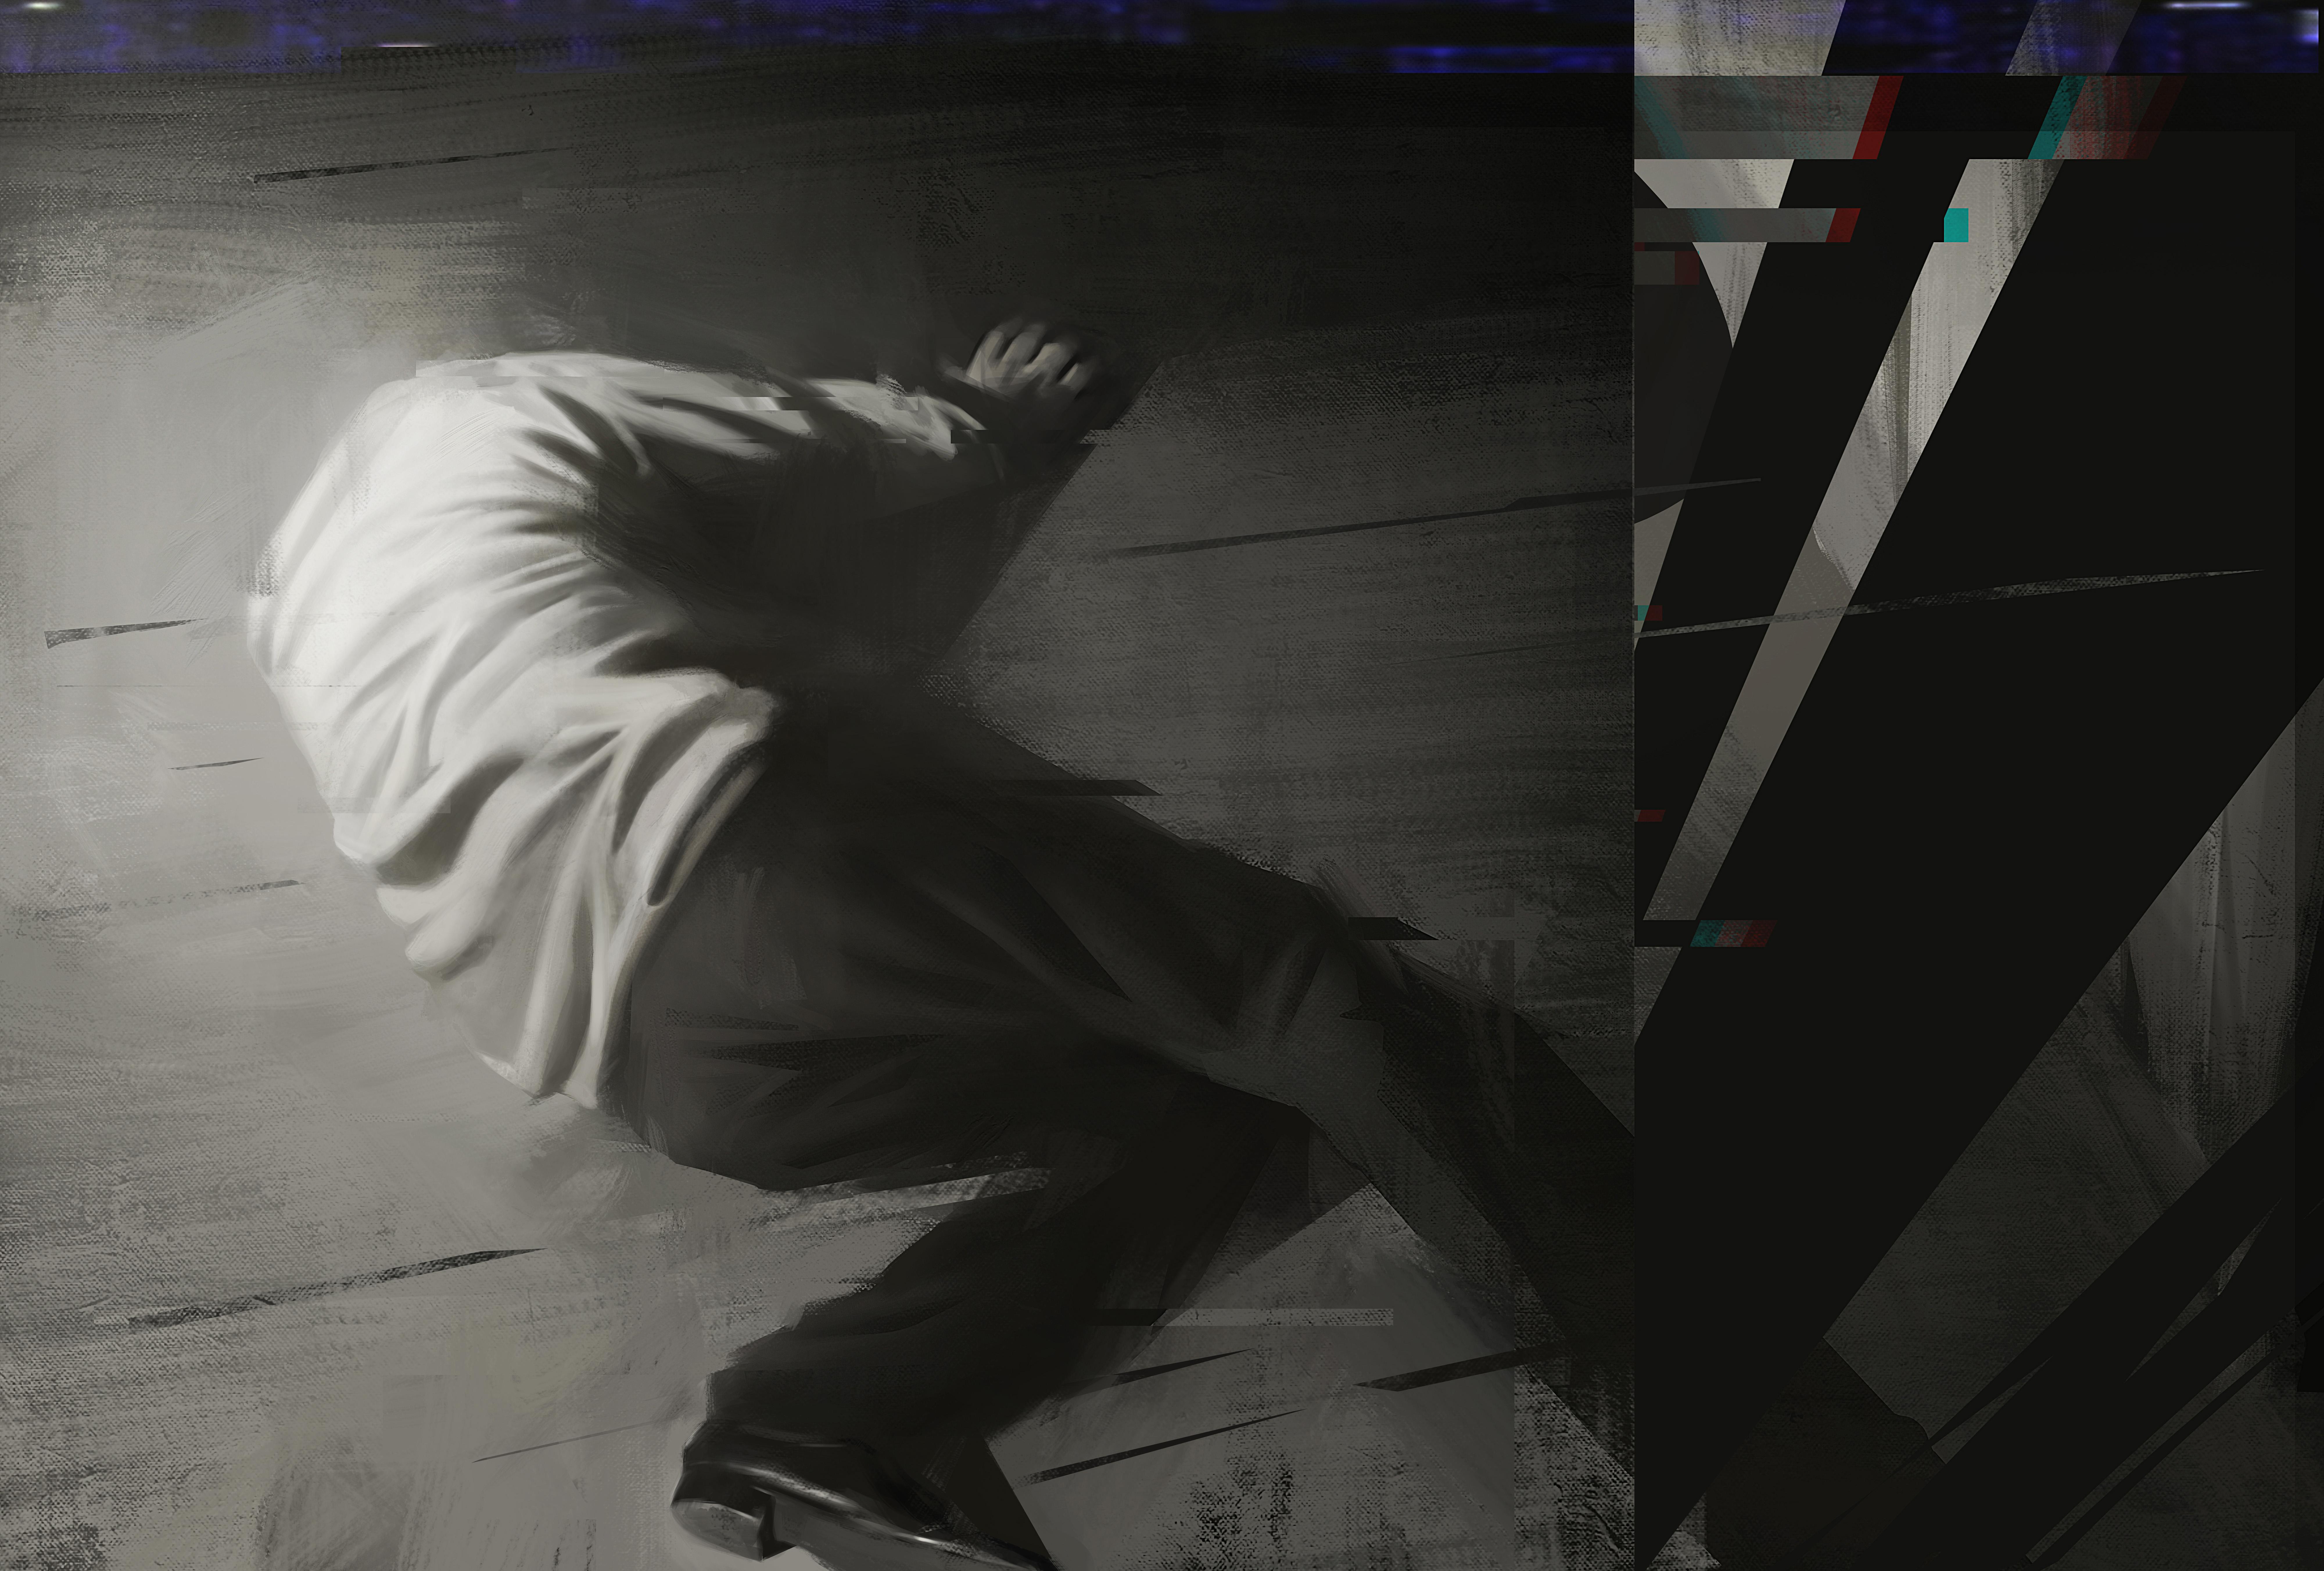 igor-kovalov-untitled-2-35x23-5inches-digital-painting.jpg